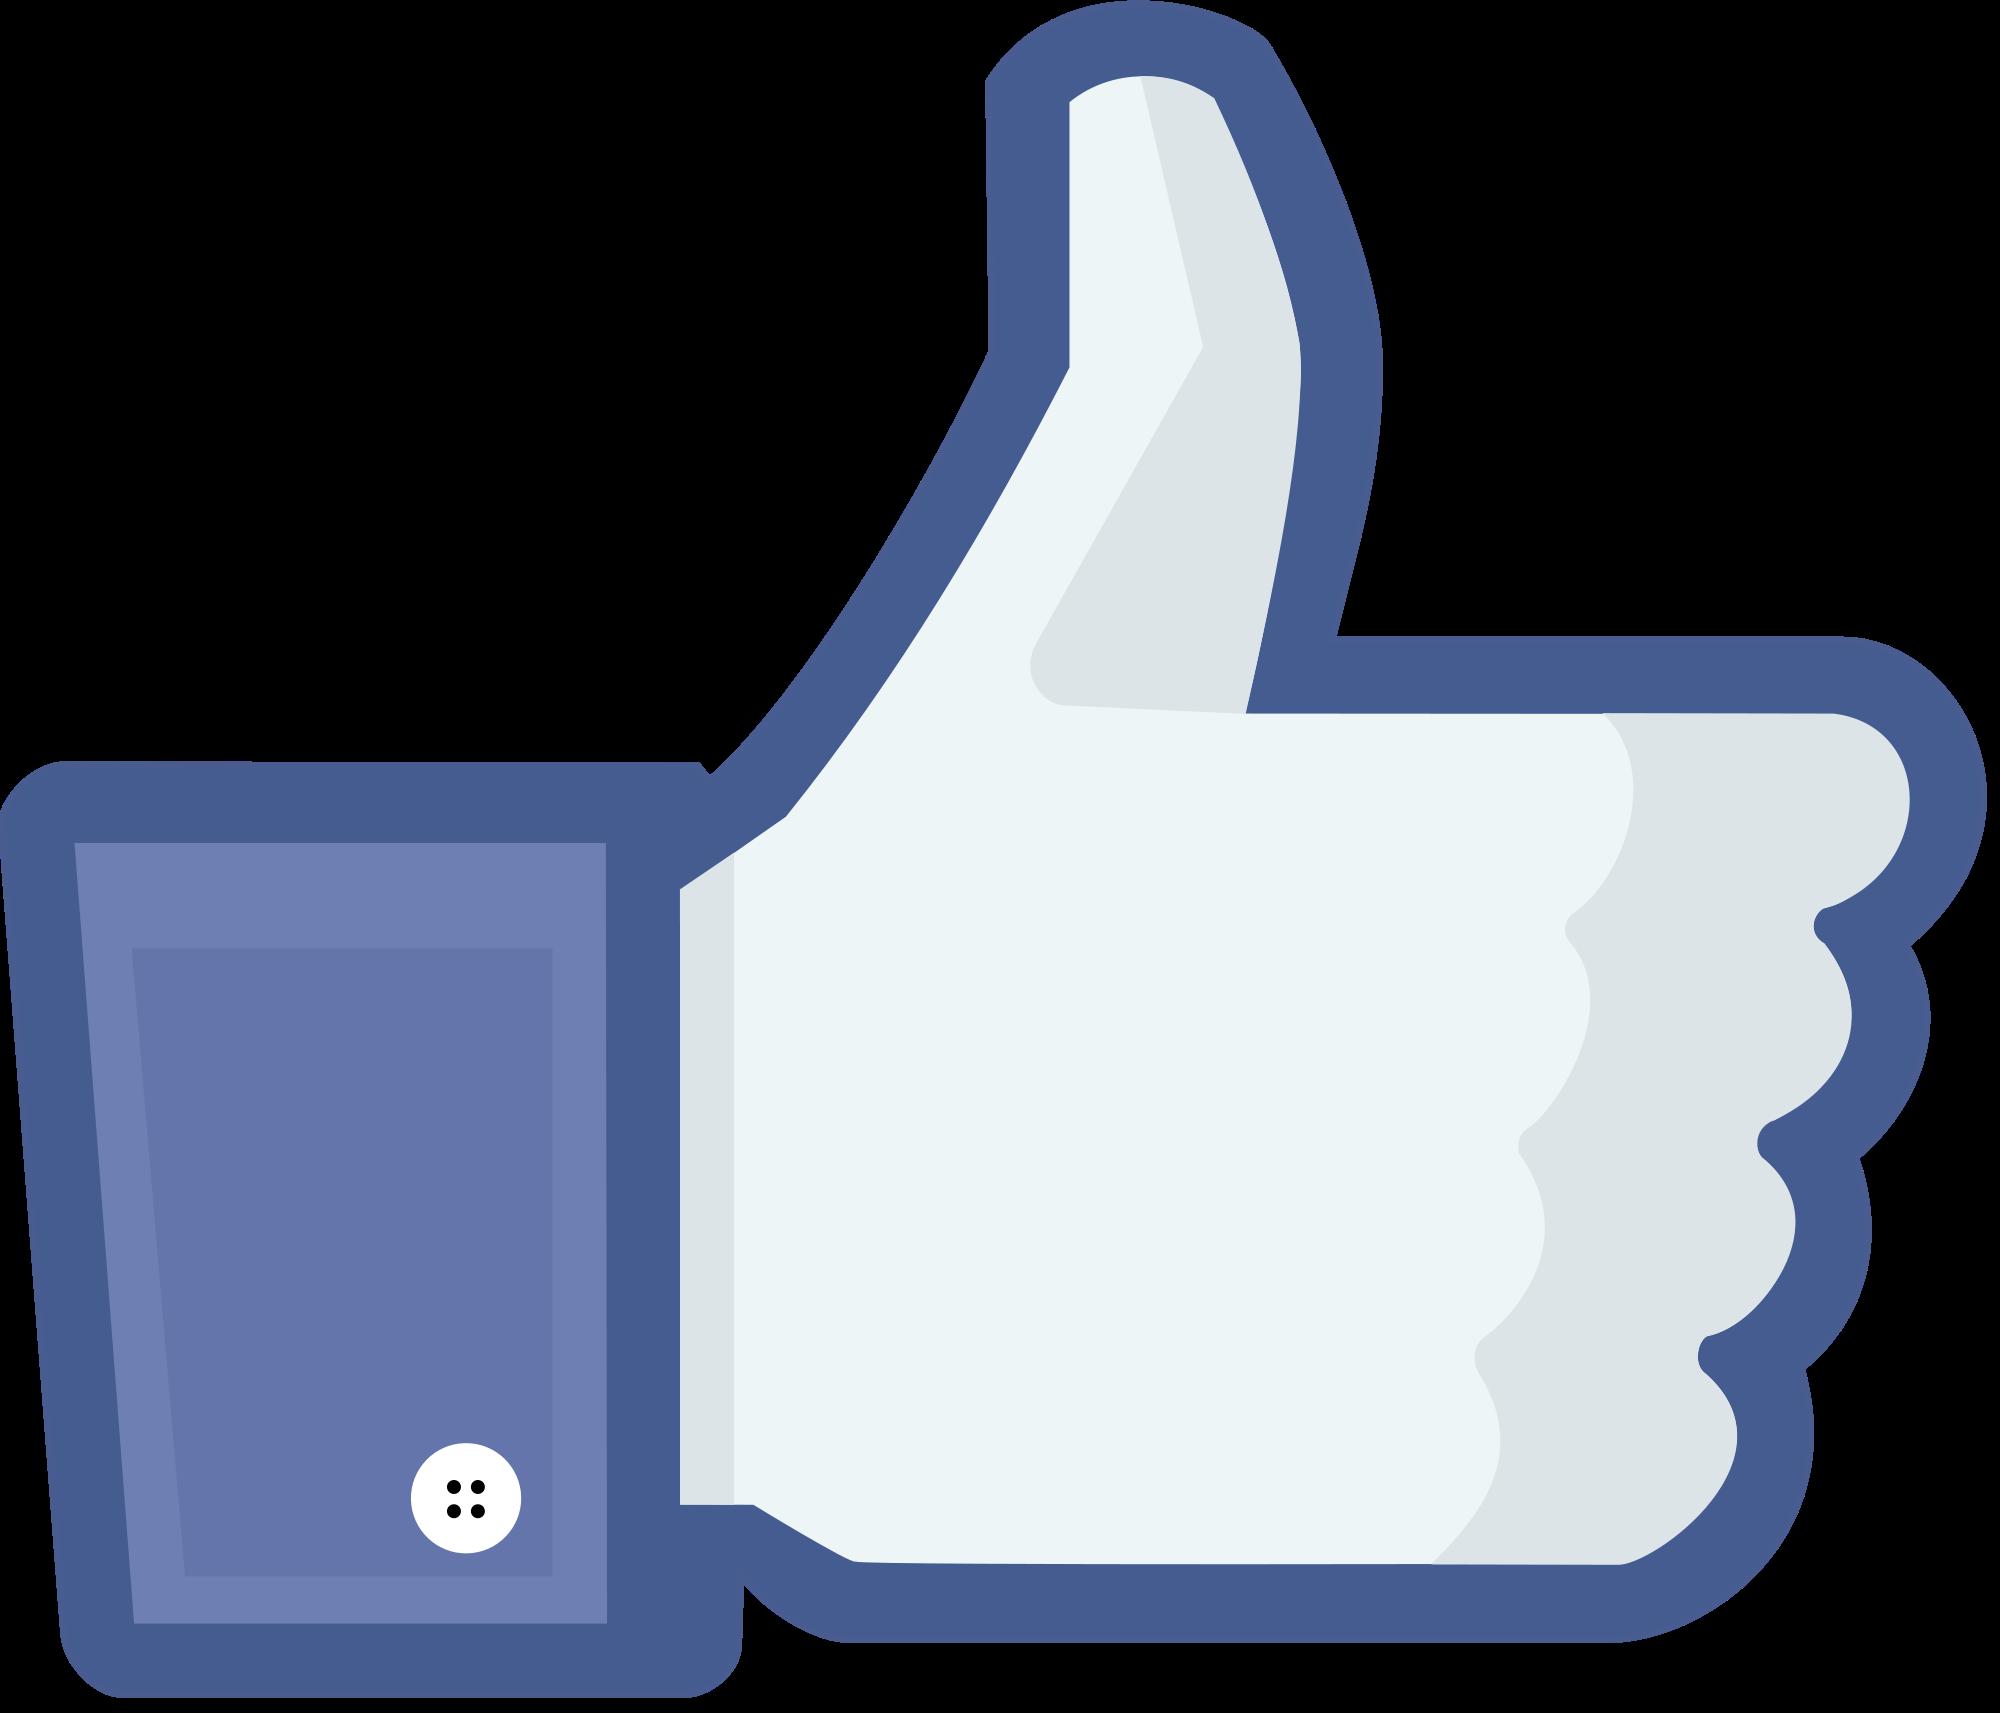 Facebook_like_thumb.png?width=100